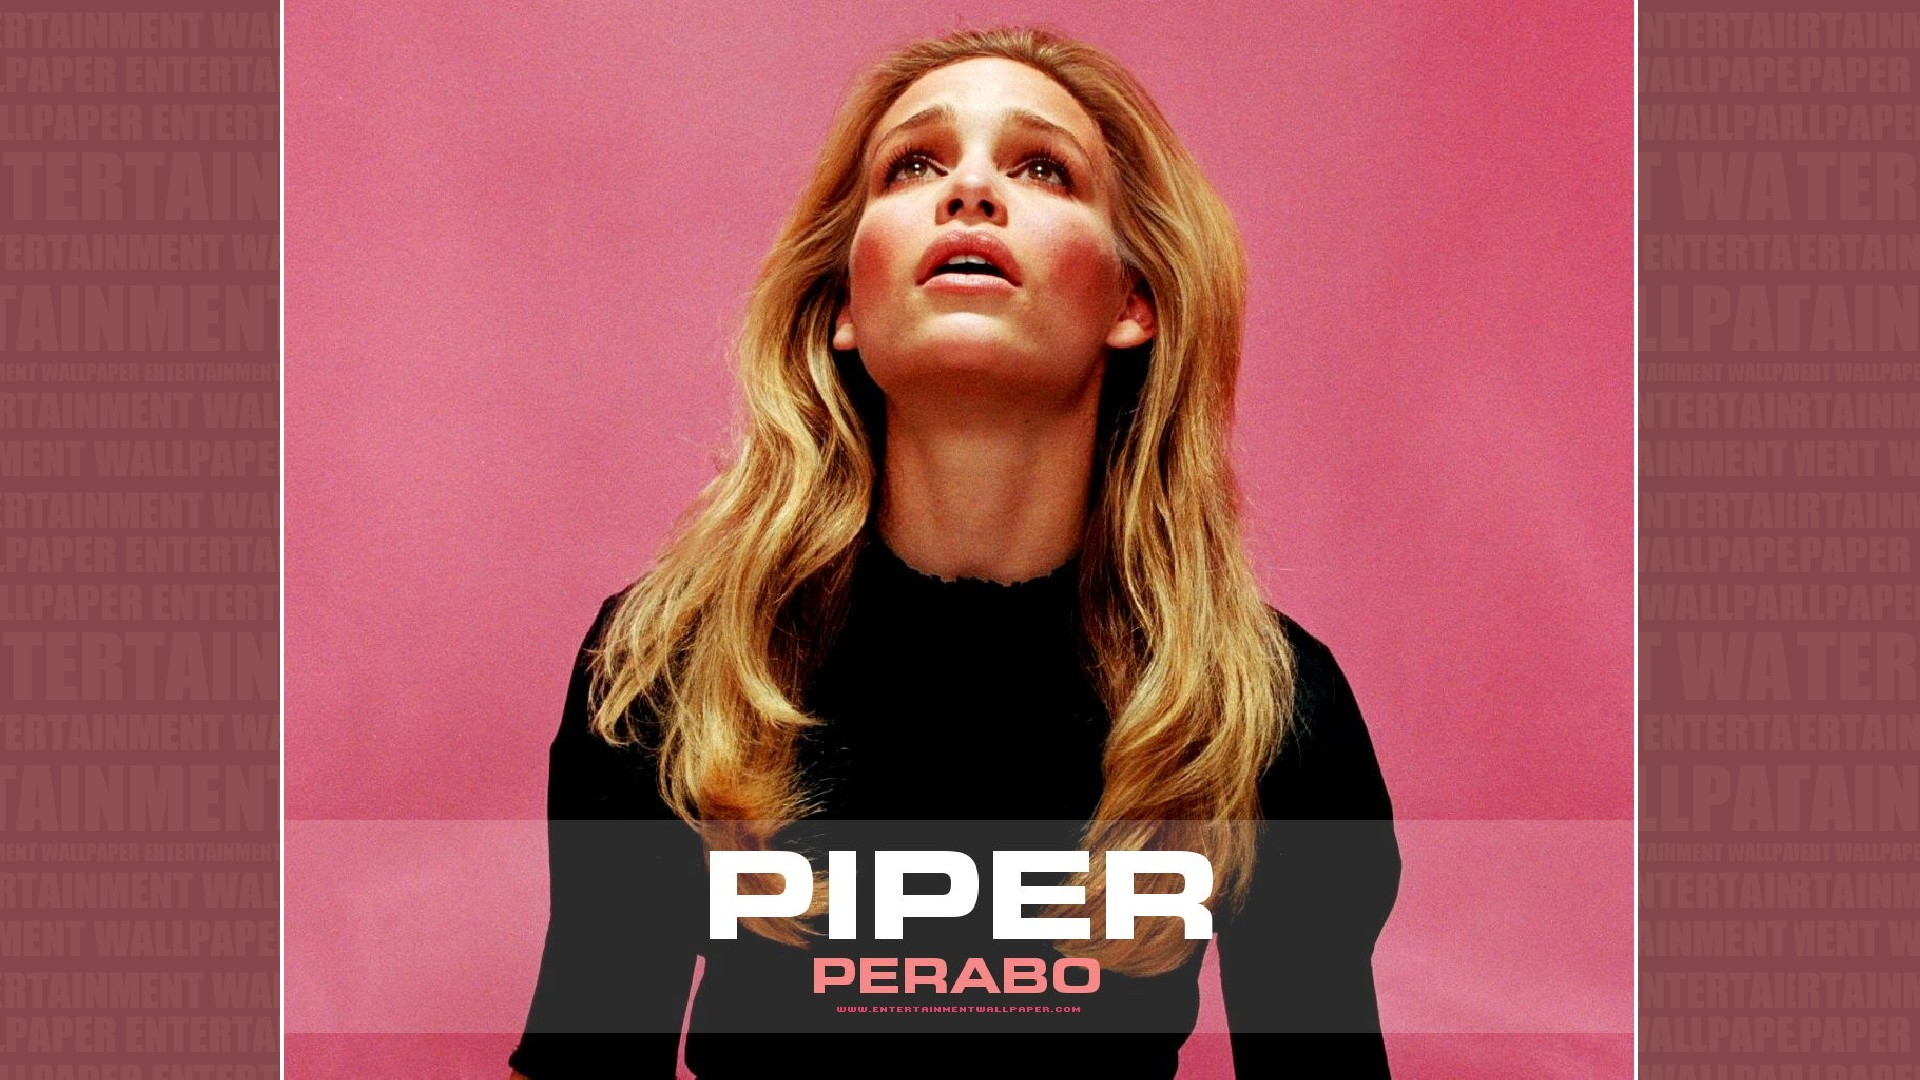 Res: 1920x1080, Piper Perabo Wallpaper - Original size, download now.